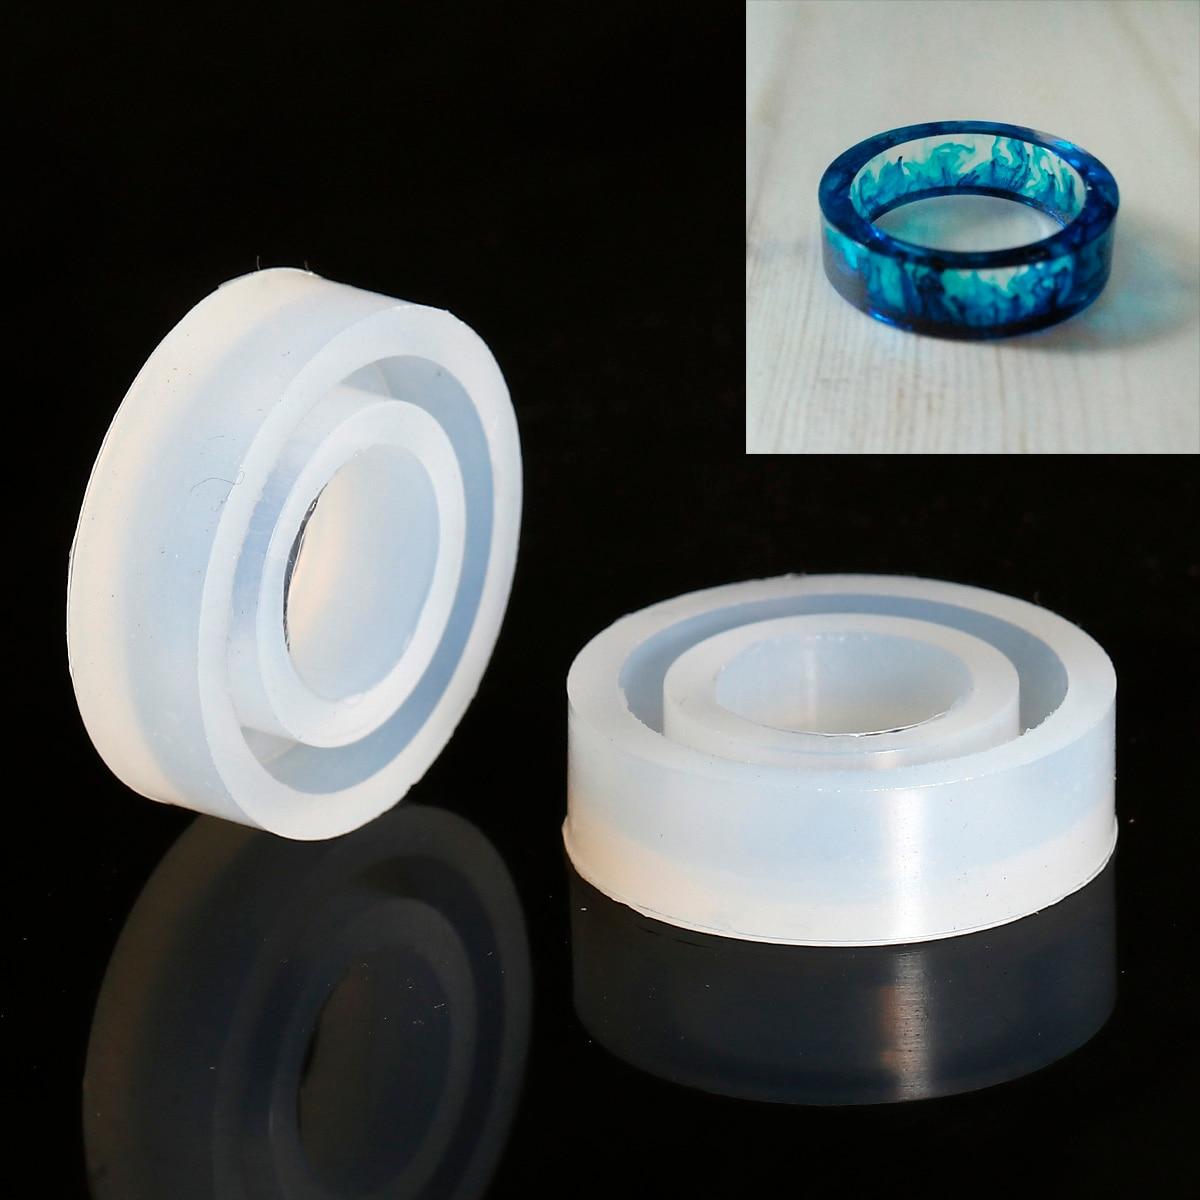 Doreen Box Silicone Resin Mold Finger Ring White 30mm(1 1/8